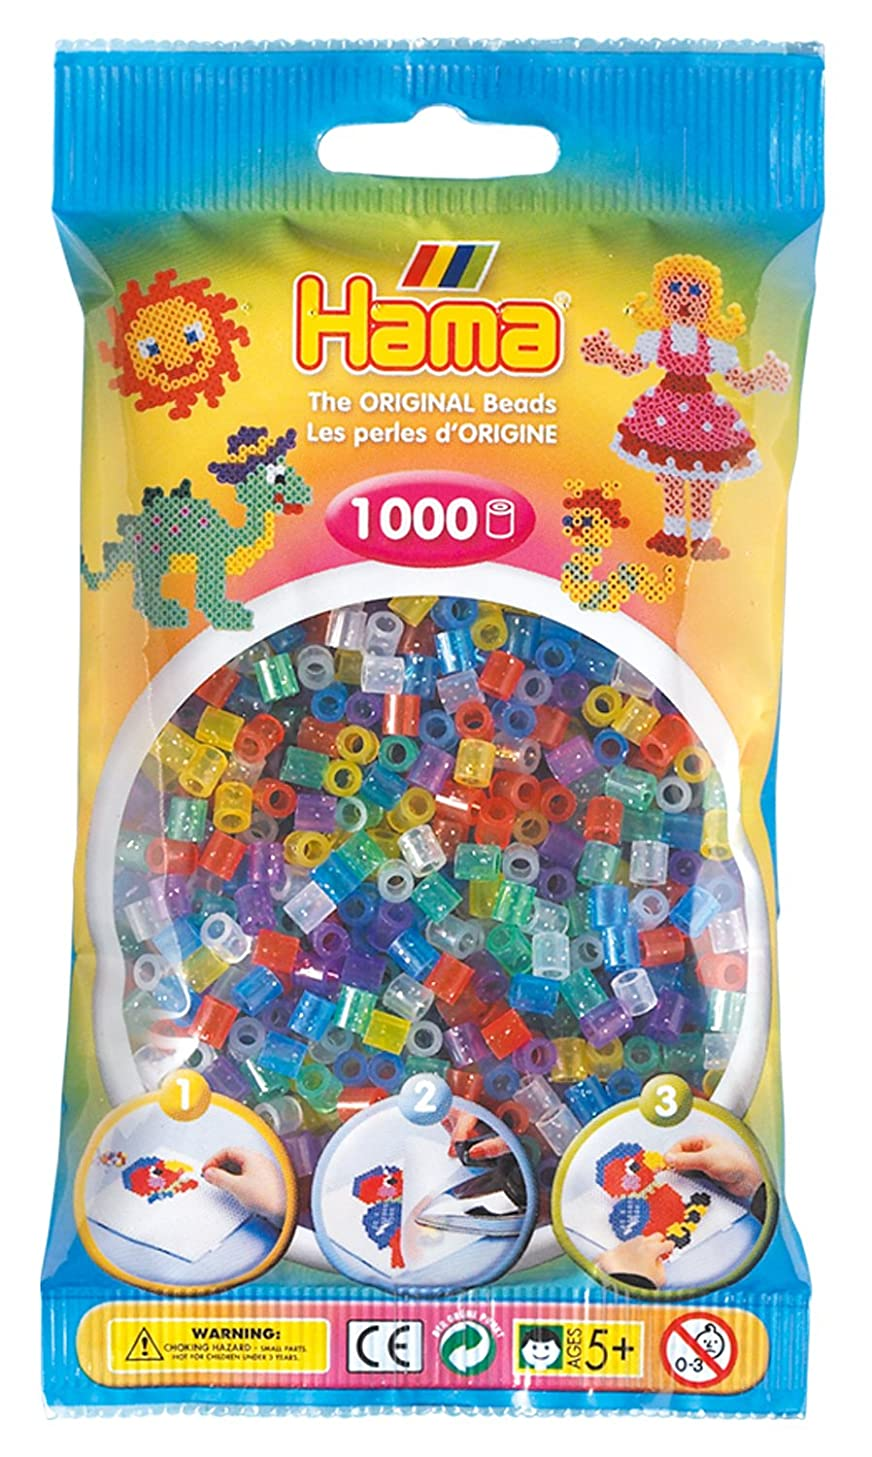 DKL Hama Beads Glitter Mix (1000 Midi Beads)